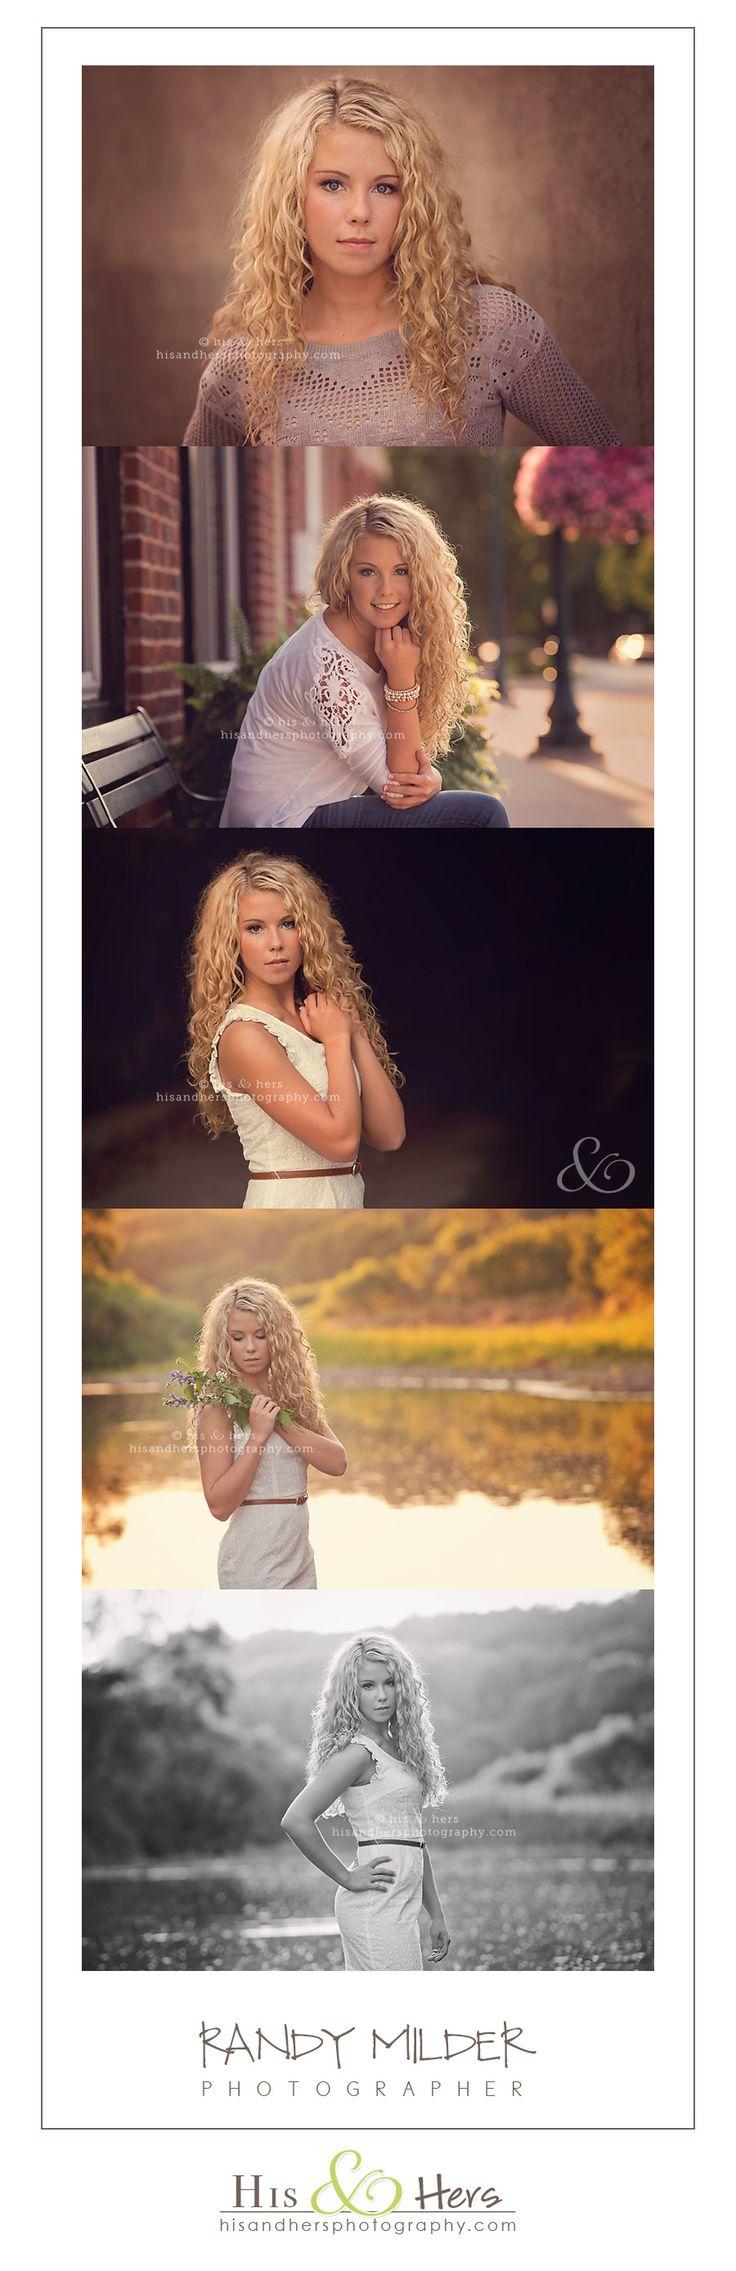 #Iowa Senior Portrait Photographer, Randy Milder | His & Hers #classof2014